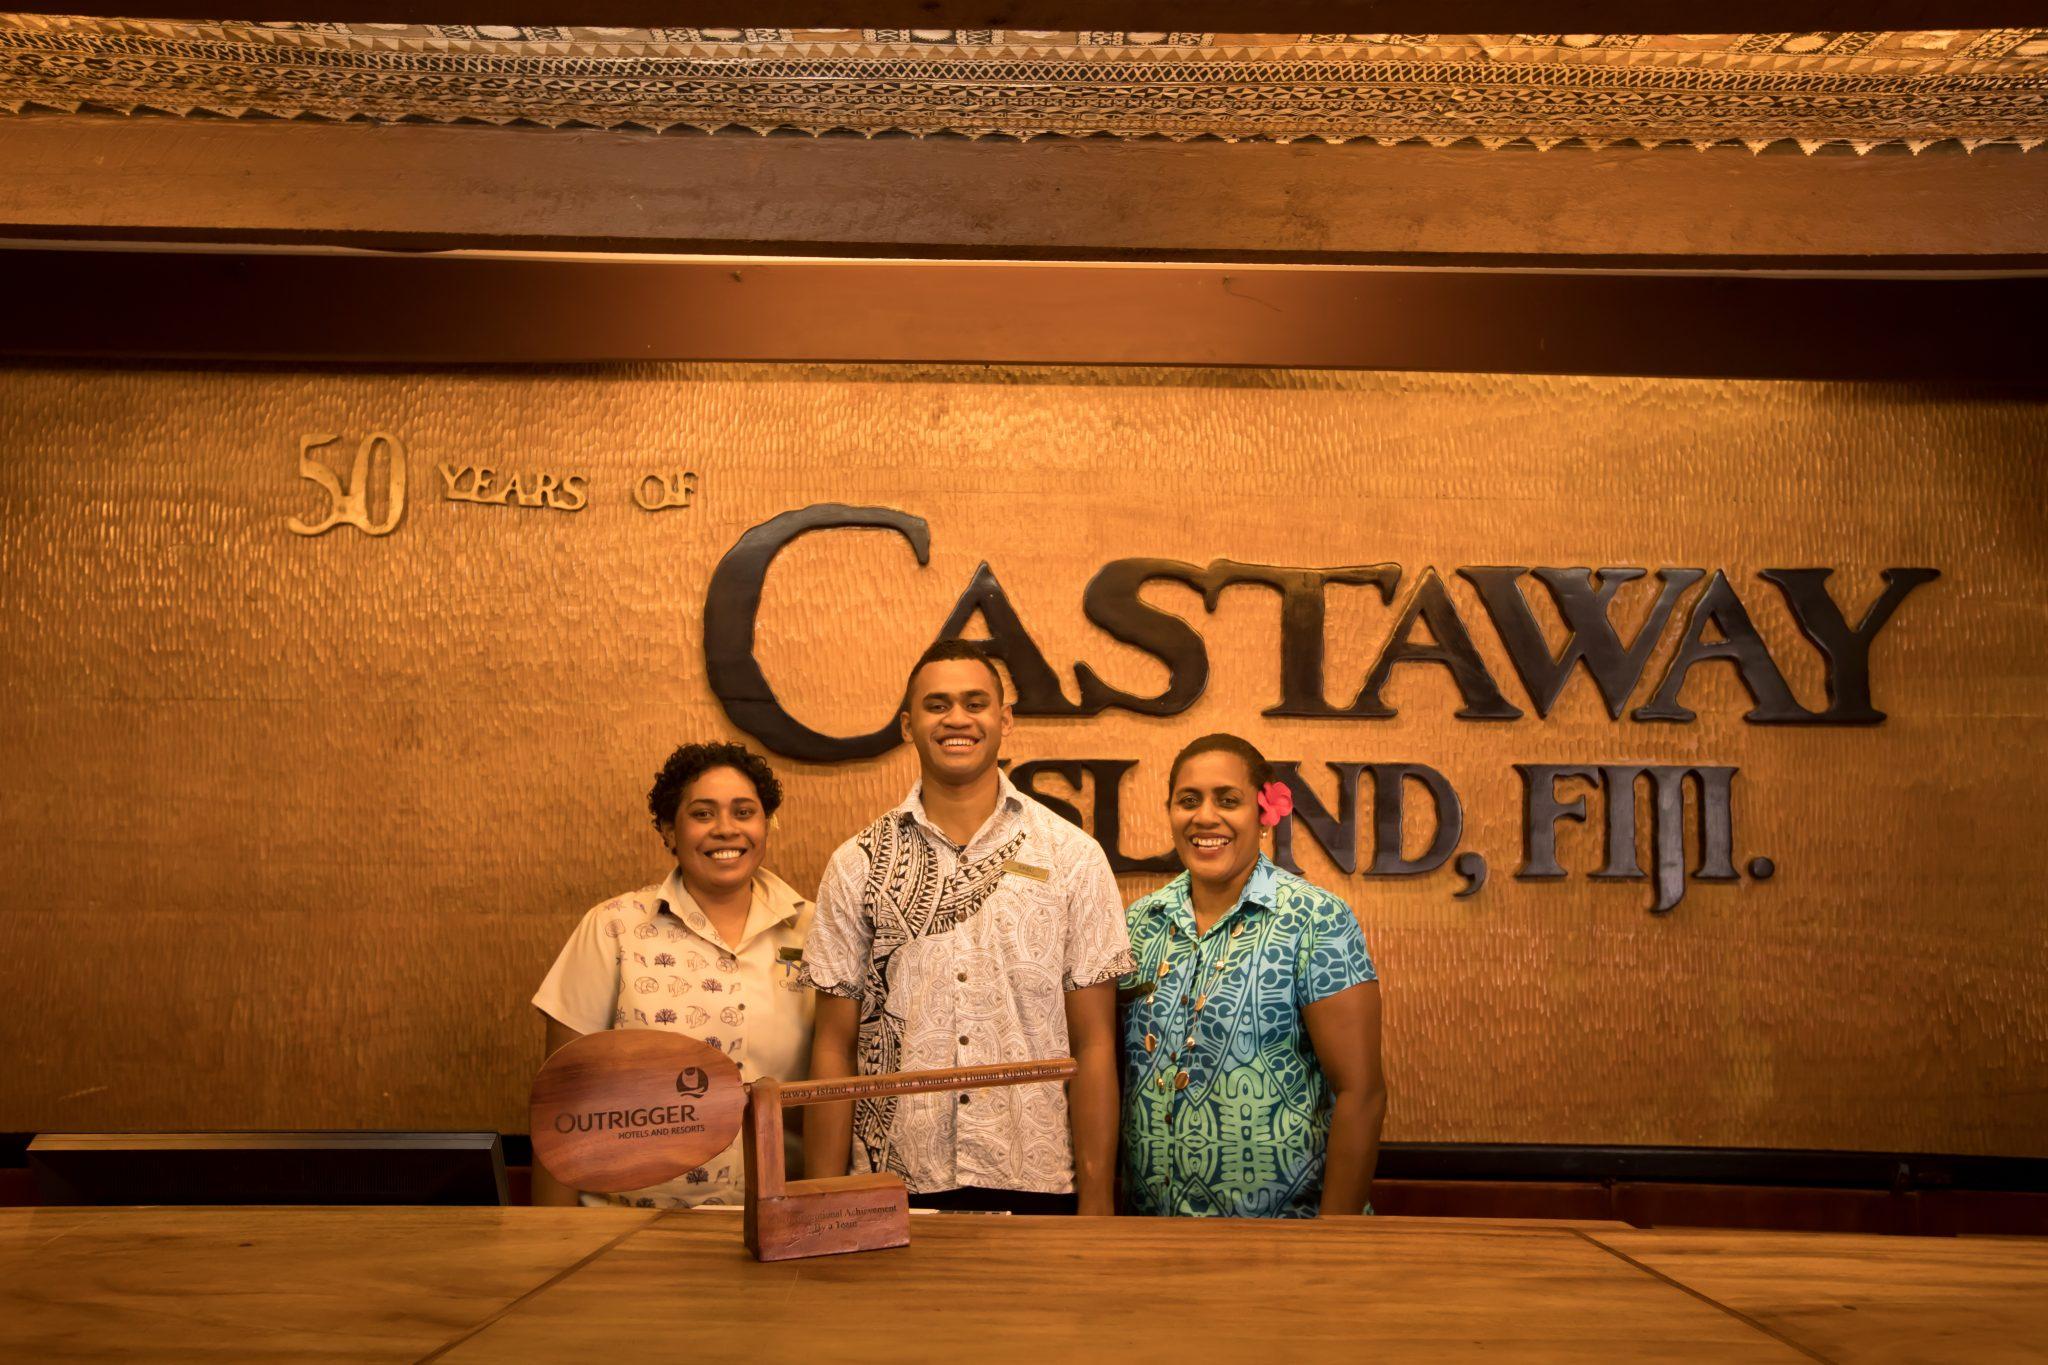 Castaway-Reception